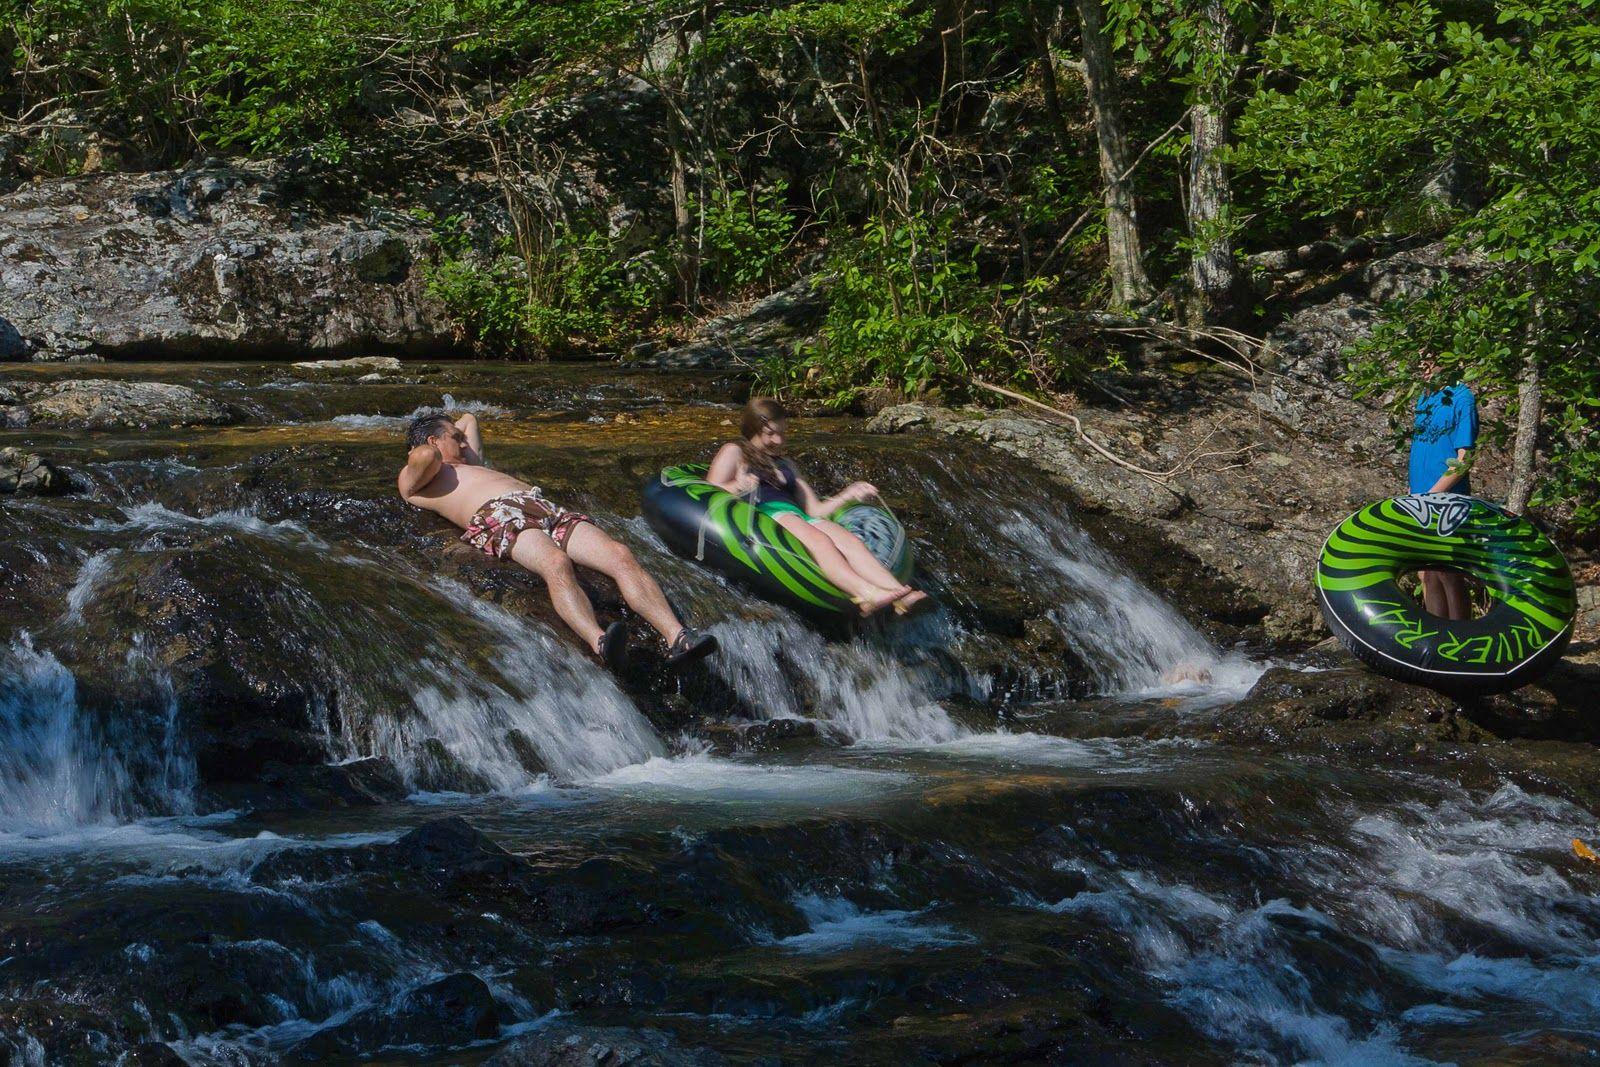 hot springs in missouri